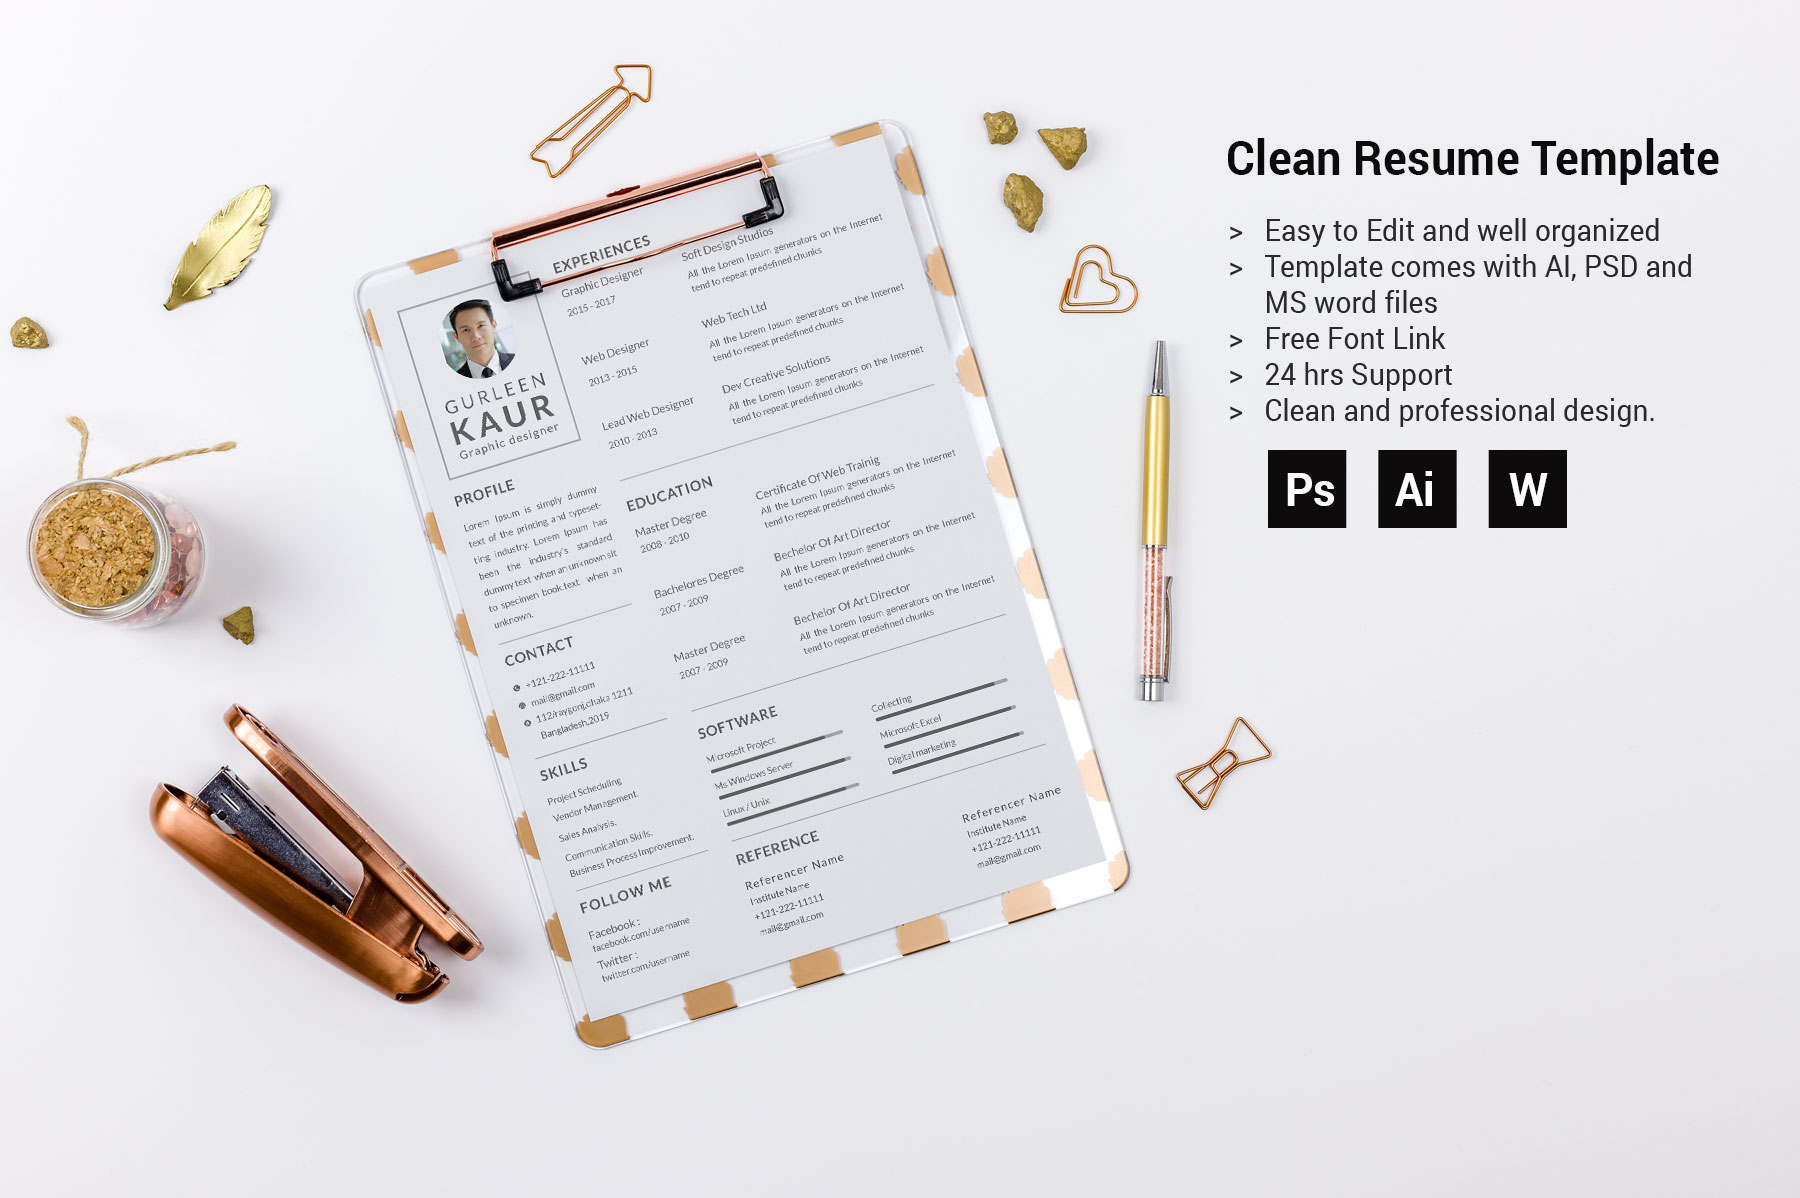 Professional Cv Resume Bonus business card Word/PSD,AI example image 3